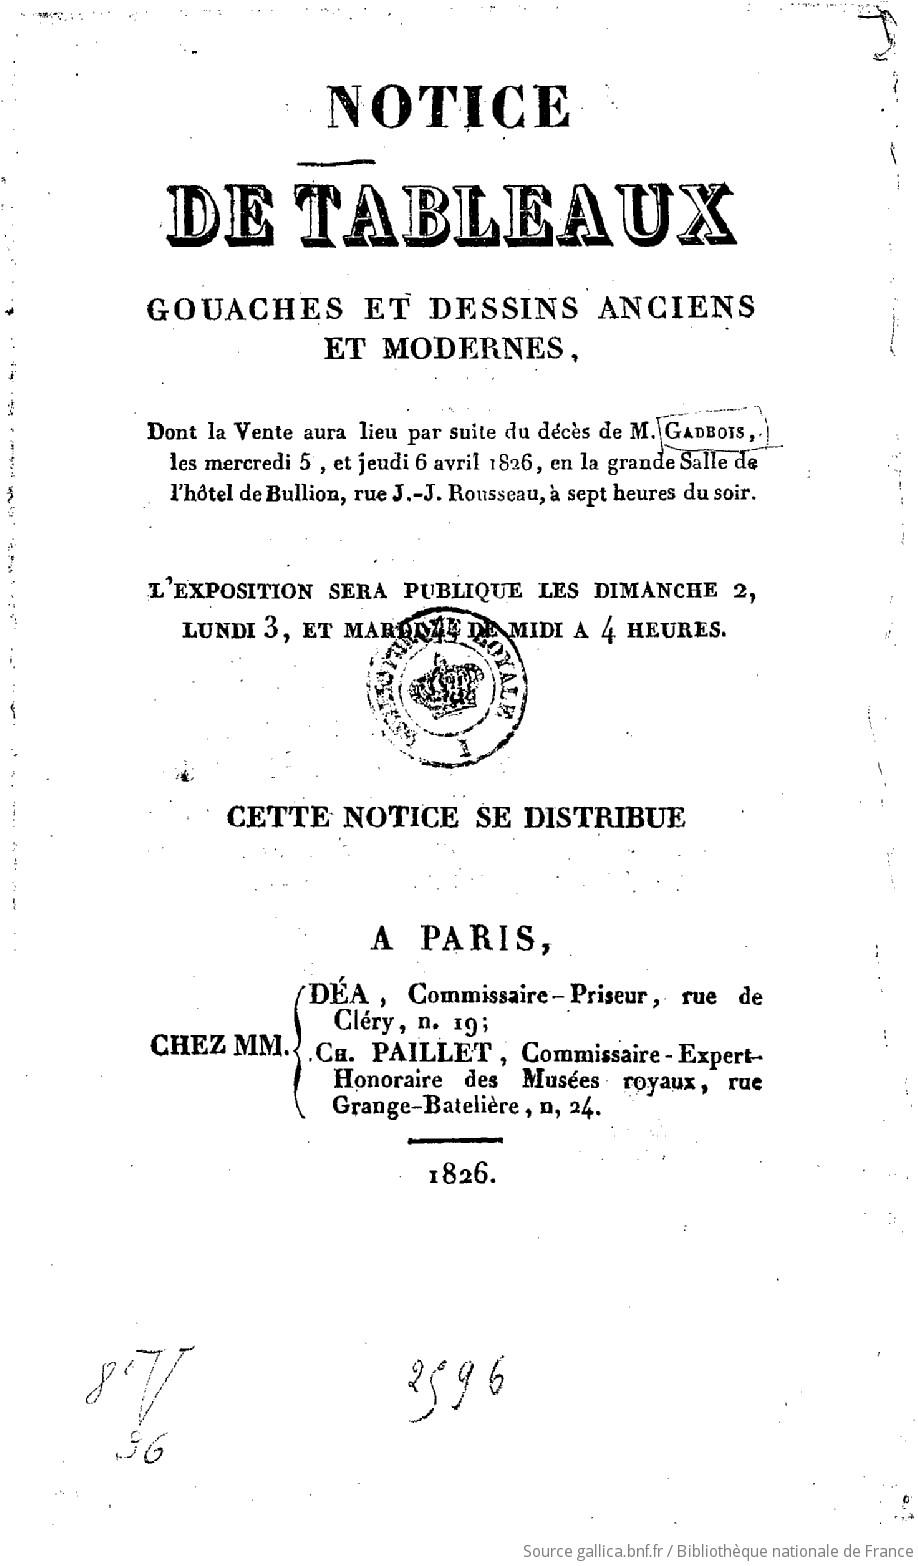 http://gallica.bnf.fr/ark:/12148/bpt6k61049743/f2.highres